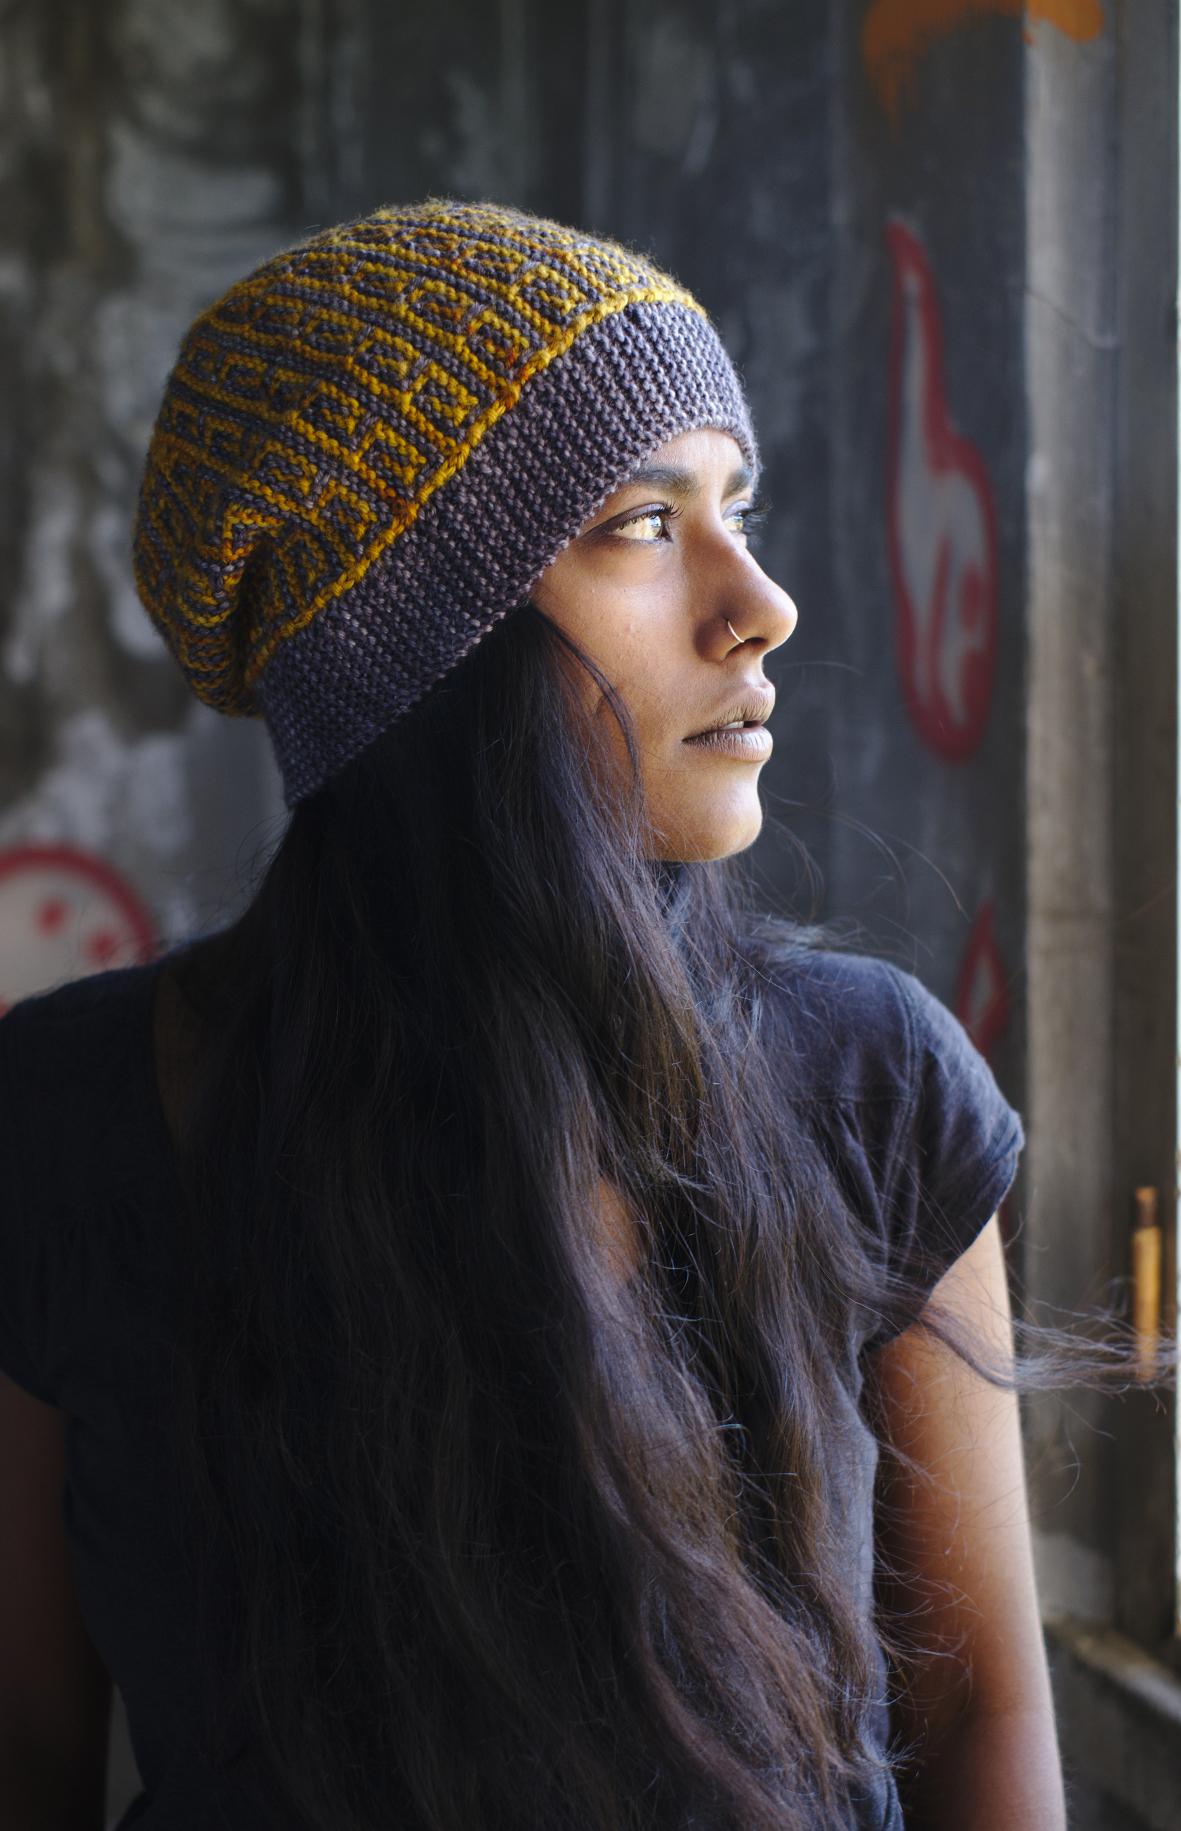 Revolutions sideways knit mosaic slipped stitch colourwork Hat hand knitting pattern for DK yarn